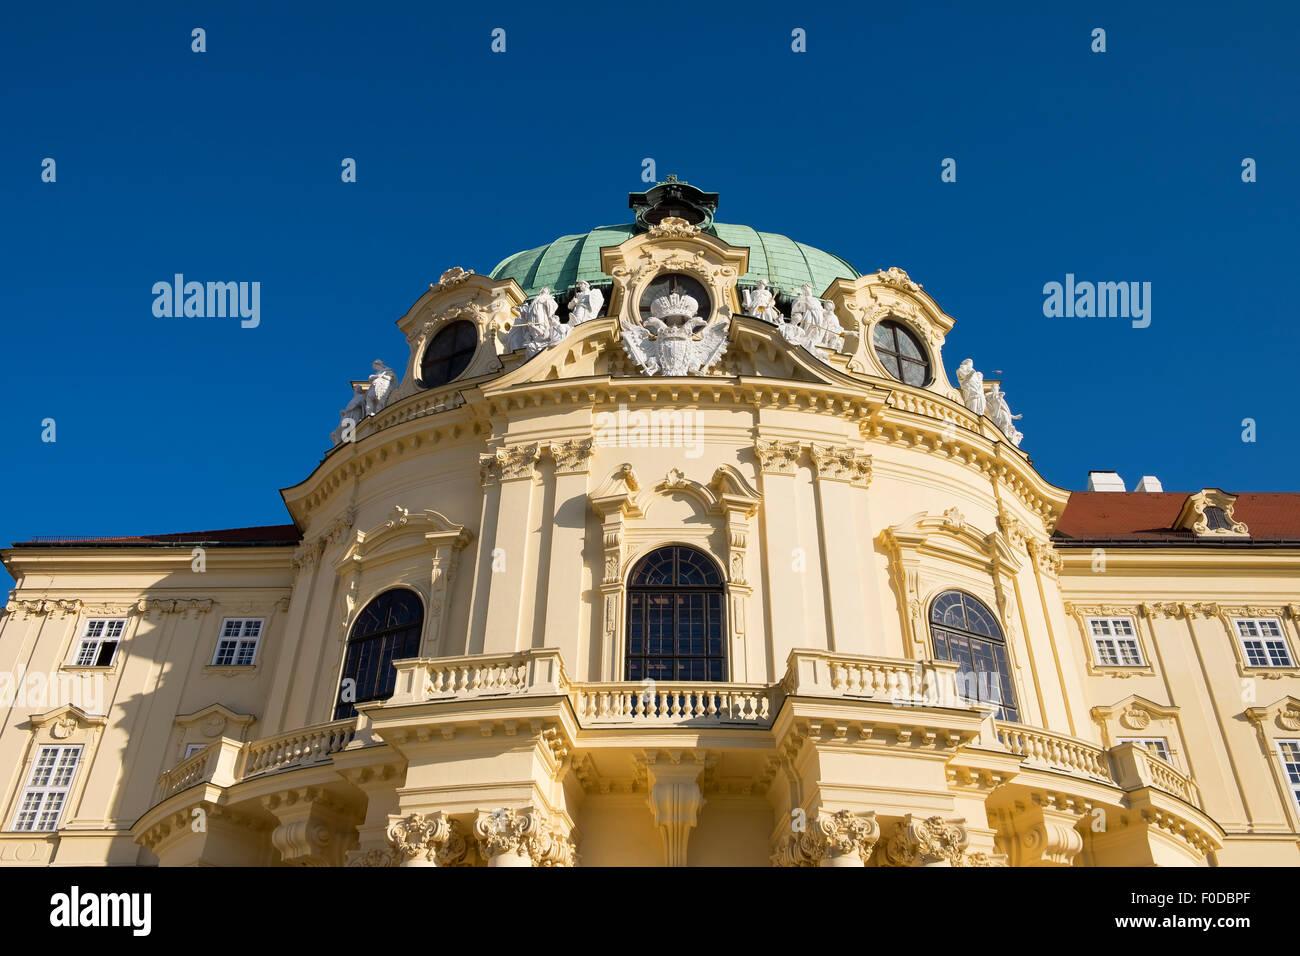 Kaiser tract of the Stift Klosterneuburg, industrial district, Lower Austria, Austria - Stock Image